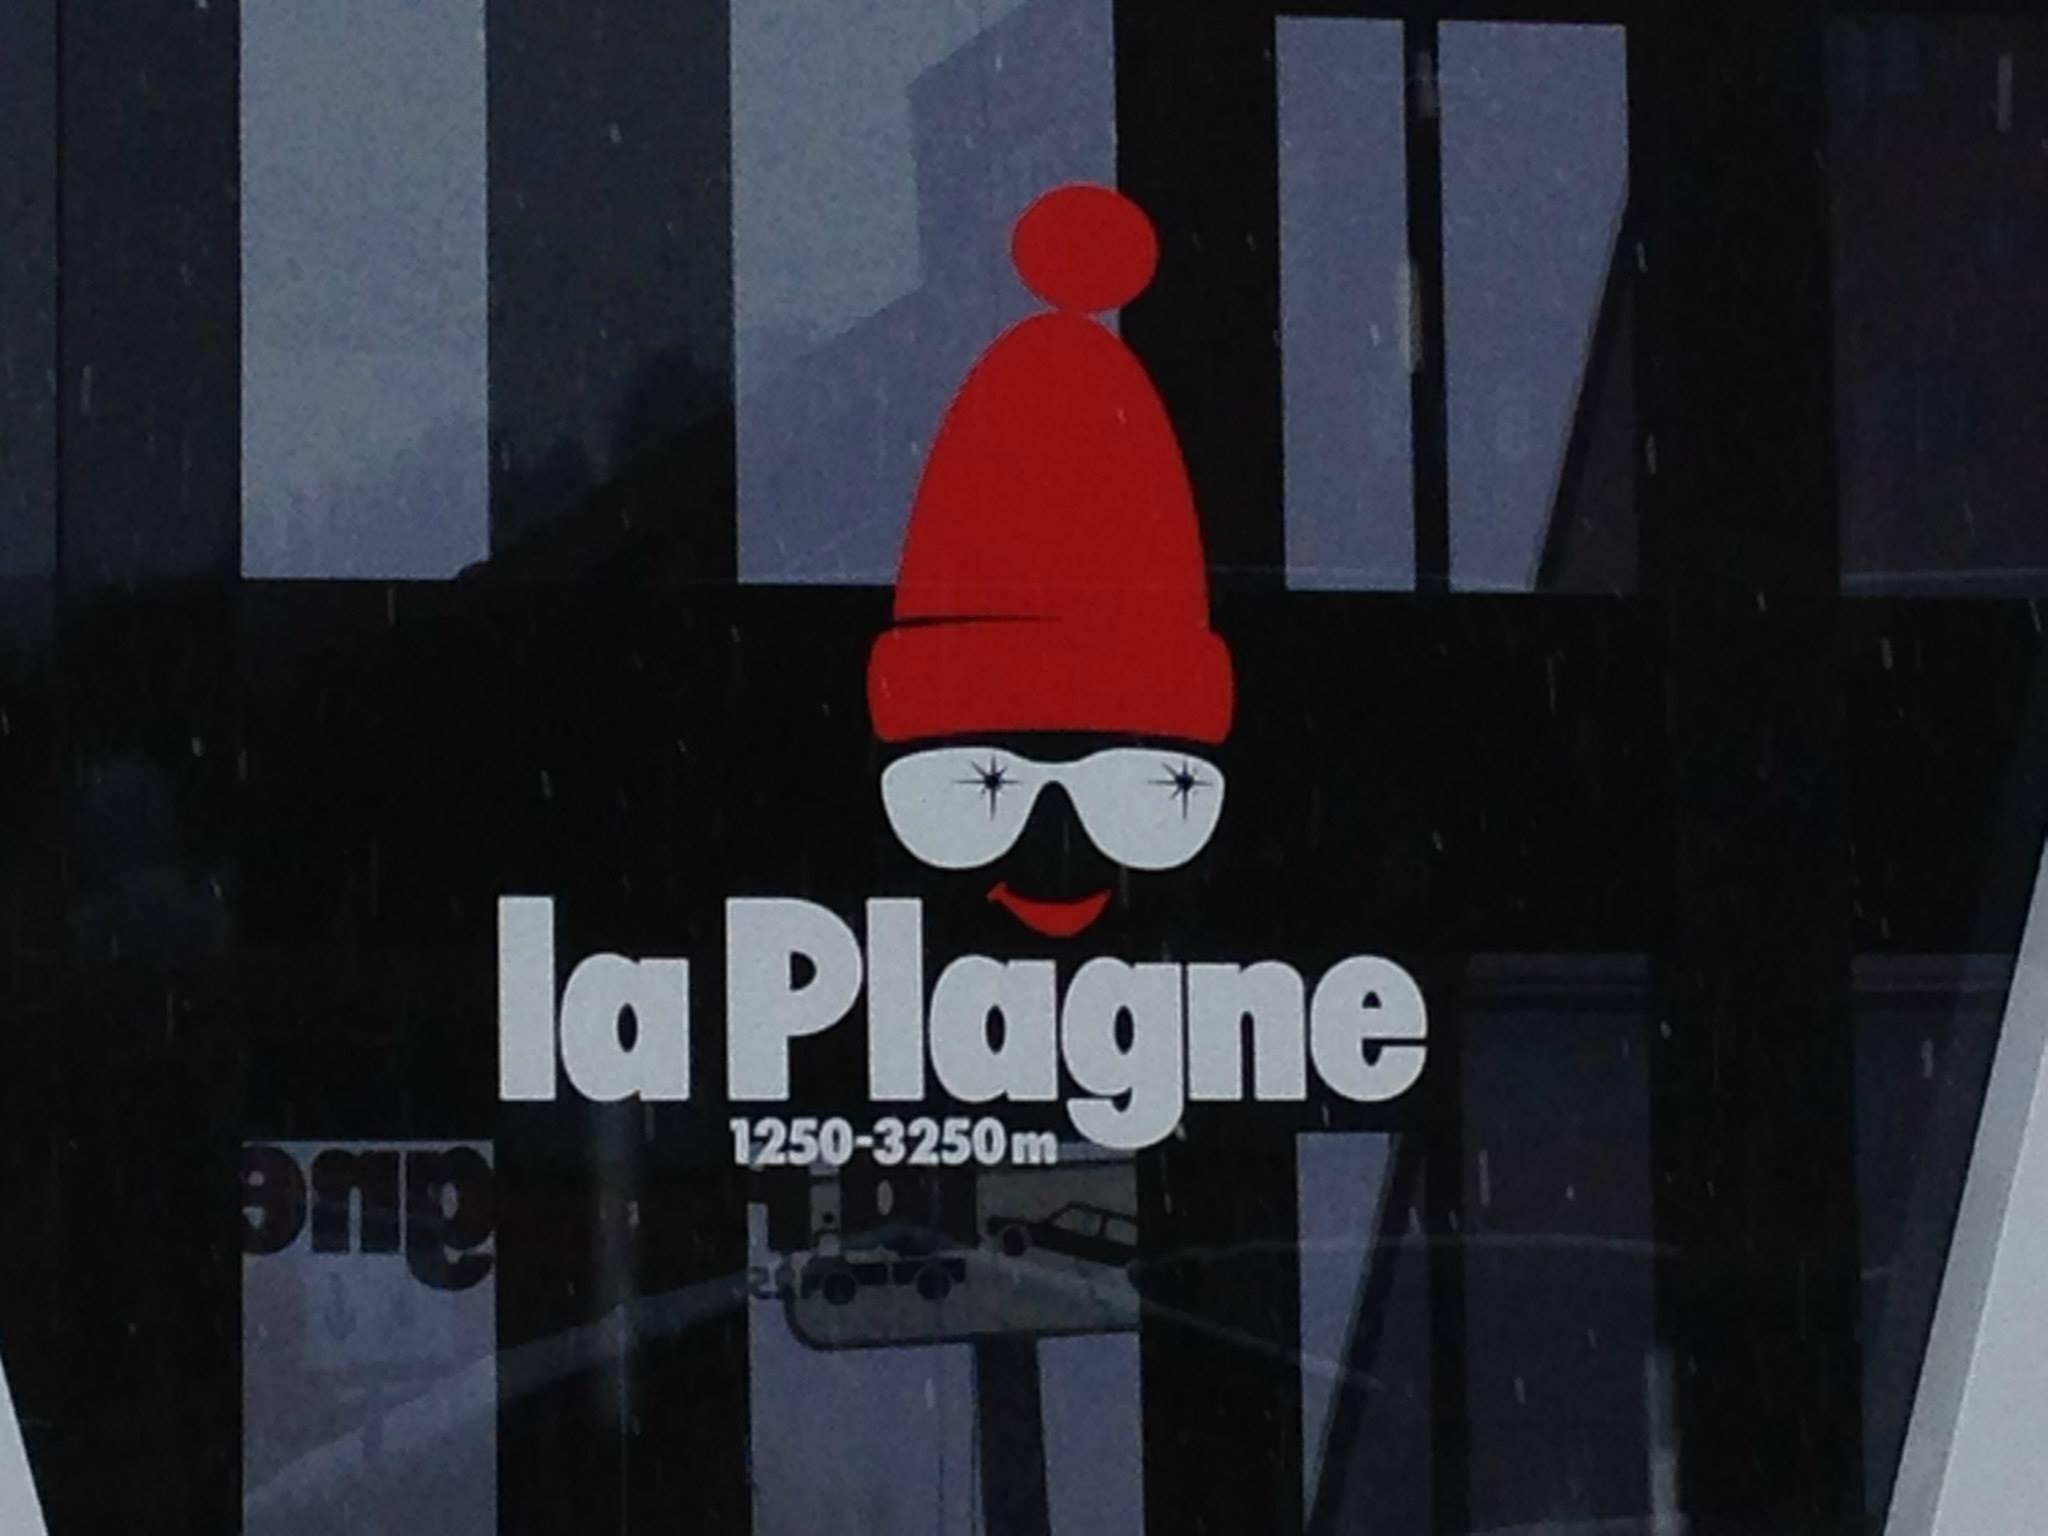 17-11-2013-La-Plagne--1